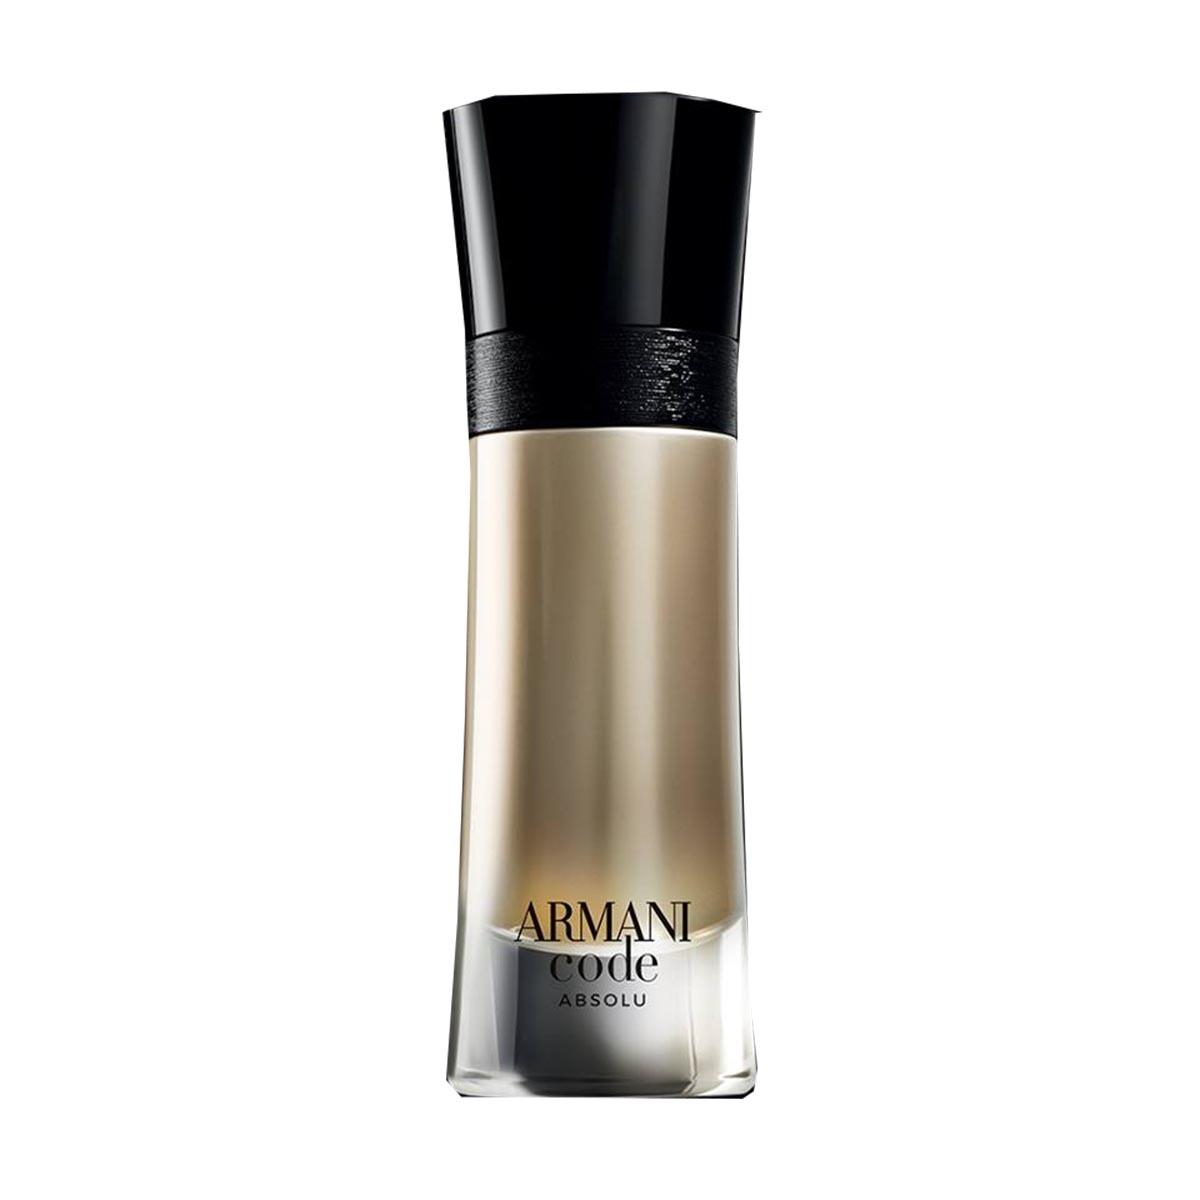 Giorgio armani code absolu eau de parfum 110ml vaporizador